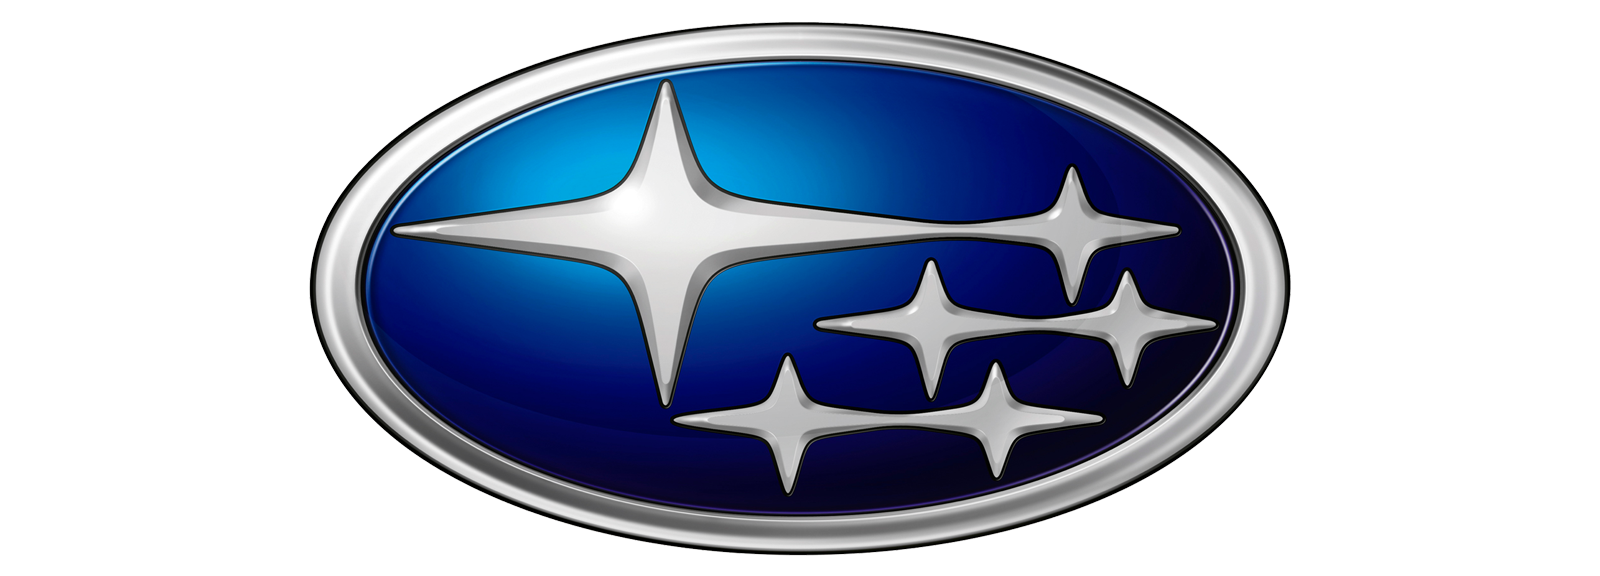 Le logo Subaru Субару, Герб, Автомобиль